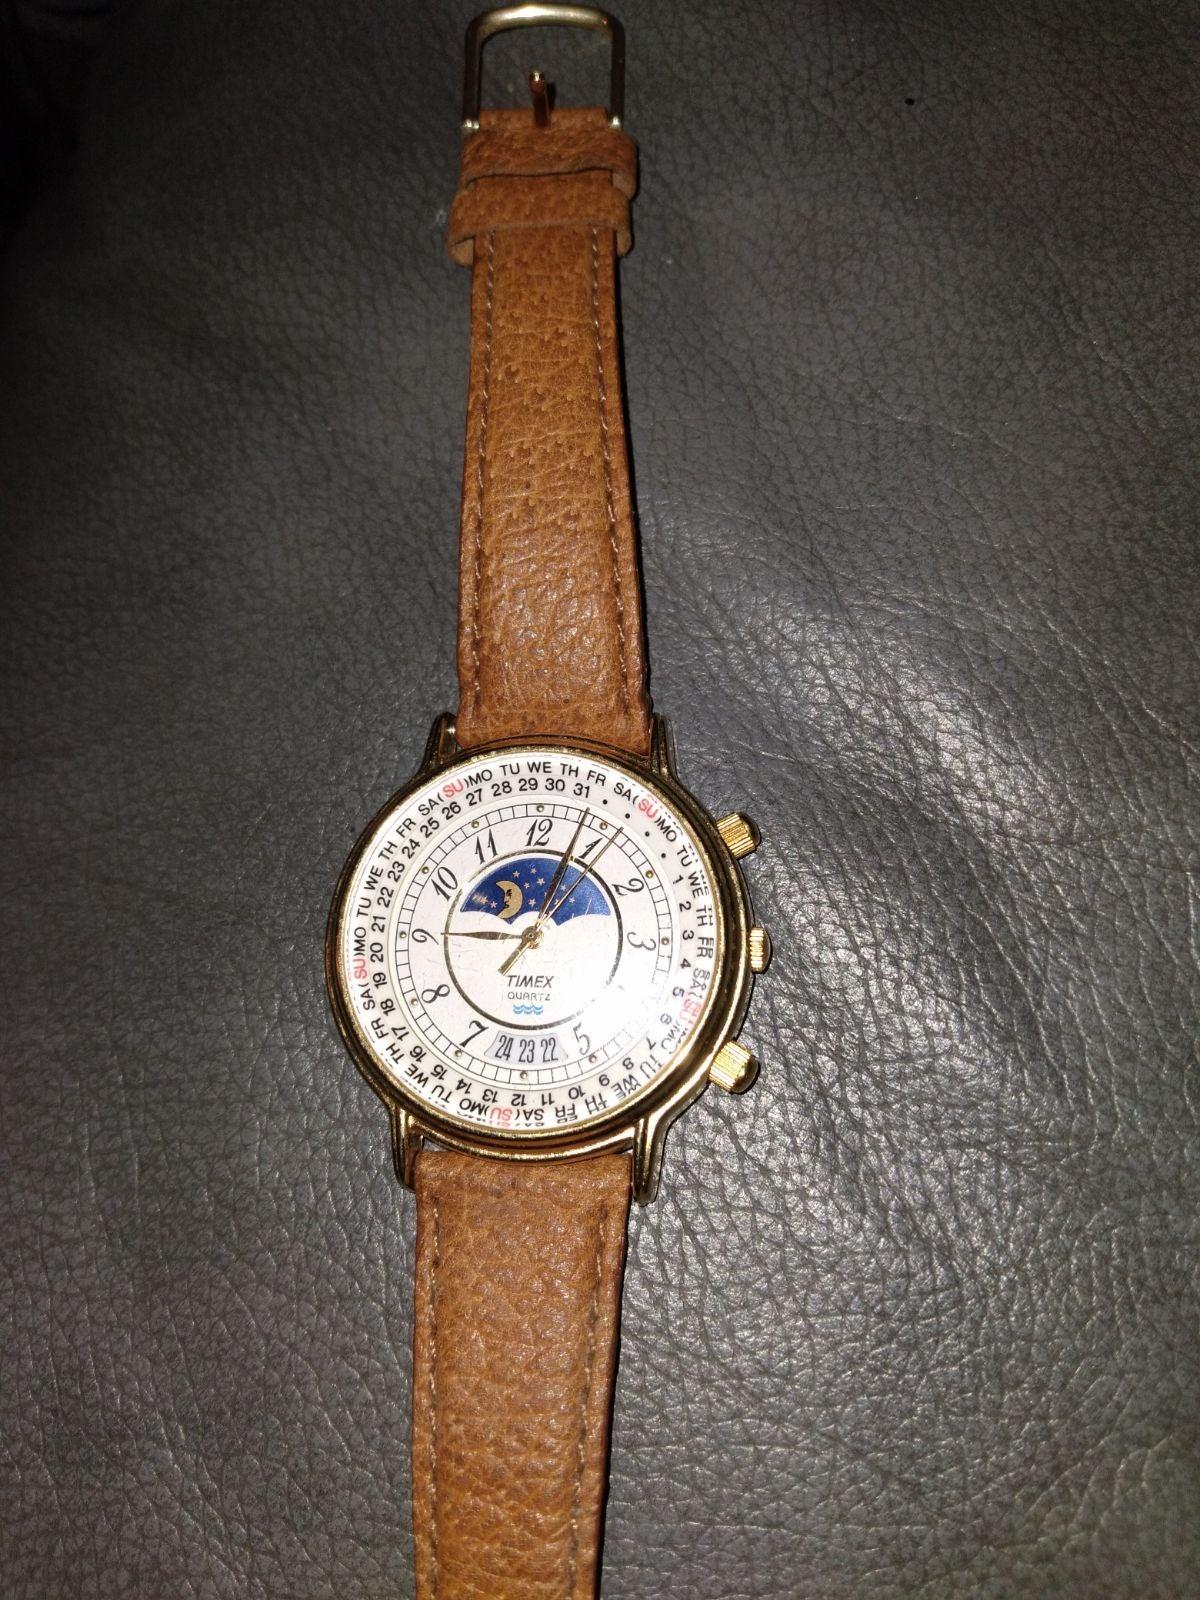 Timex moonphase vintage watch